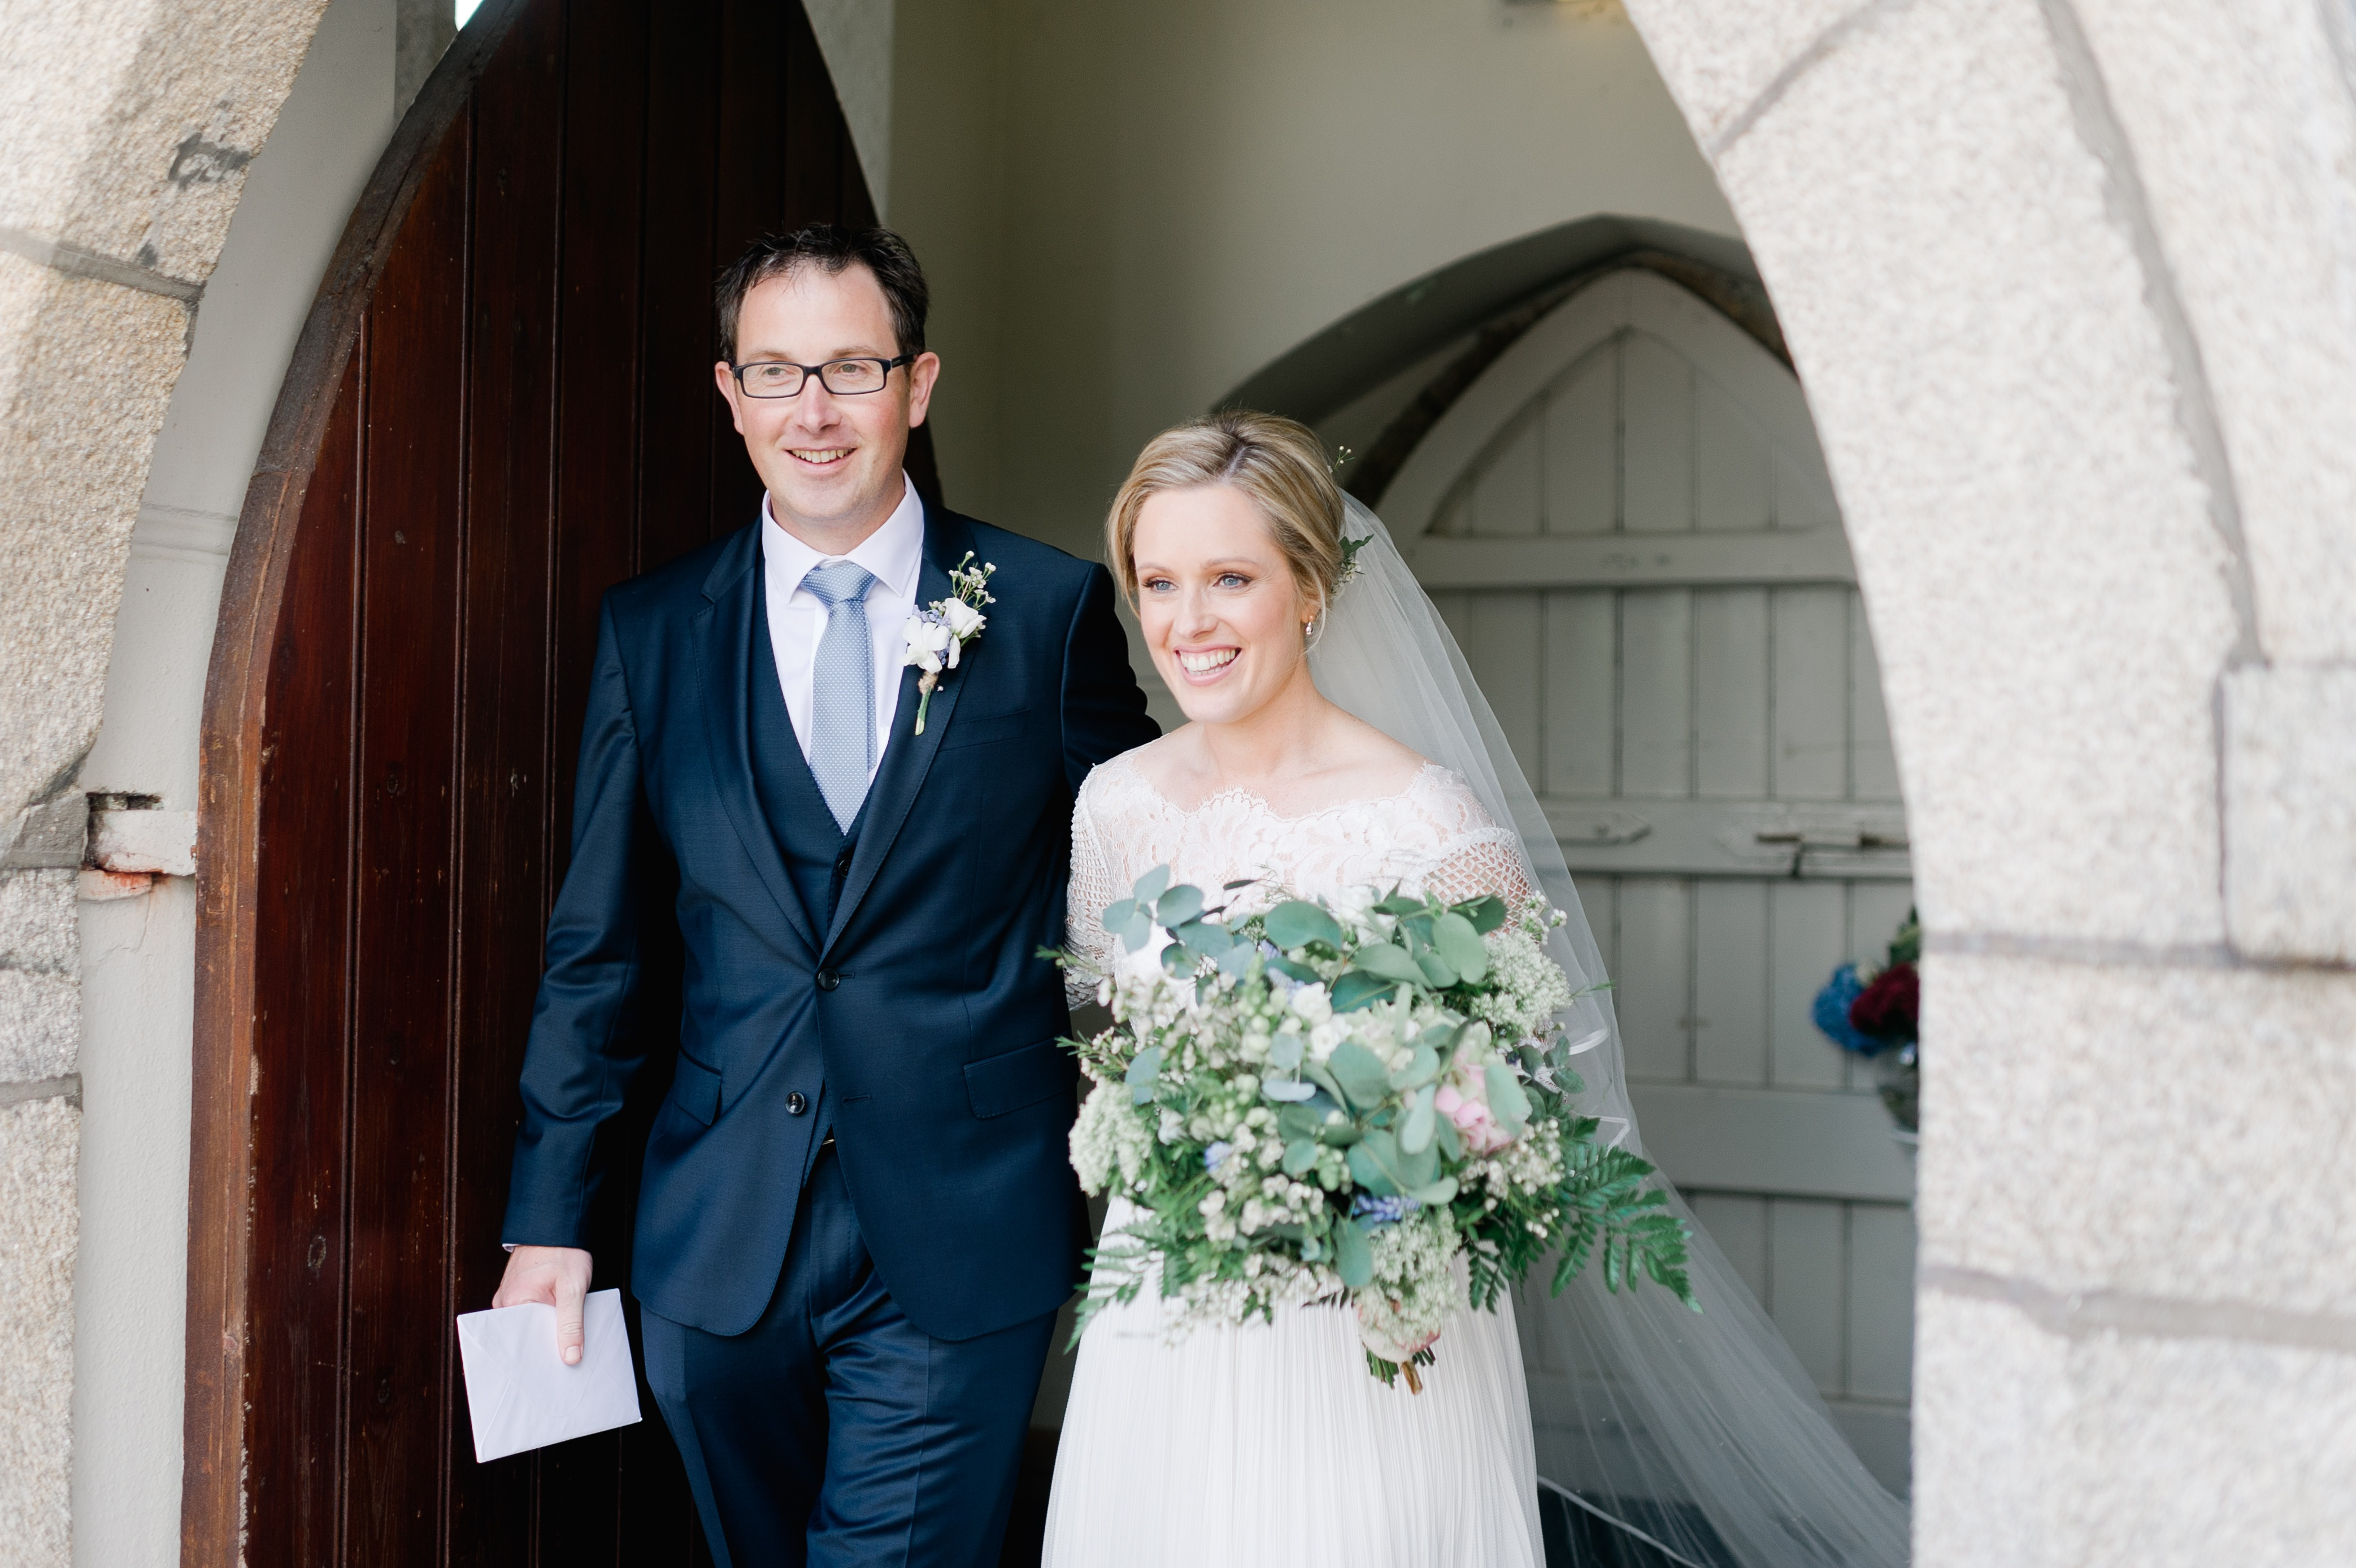 Tanya-Eden_photography-Wedding_Photographs_by_Nadia_Meli431